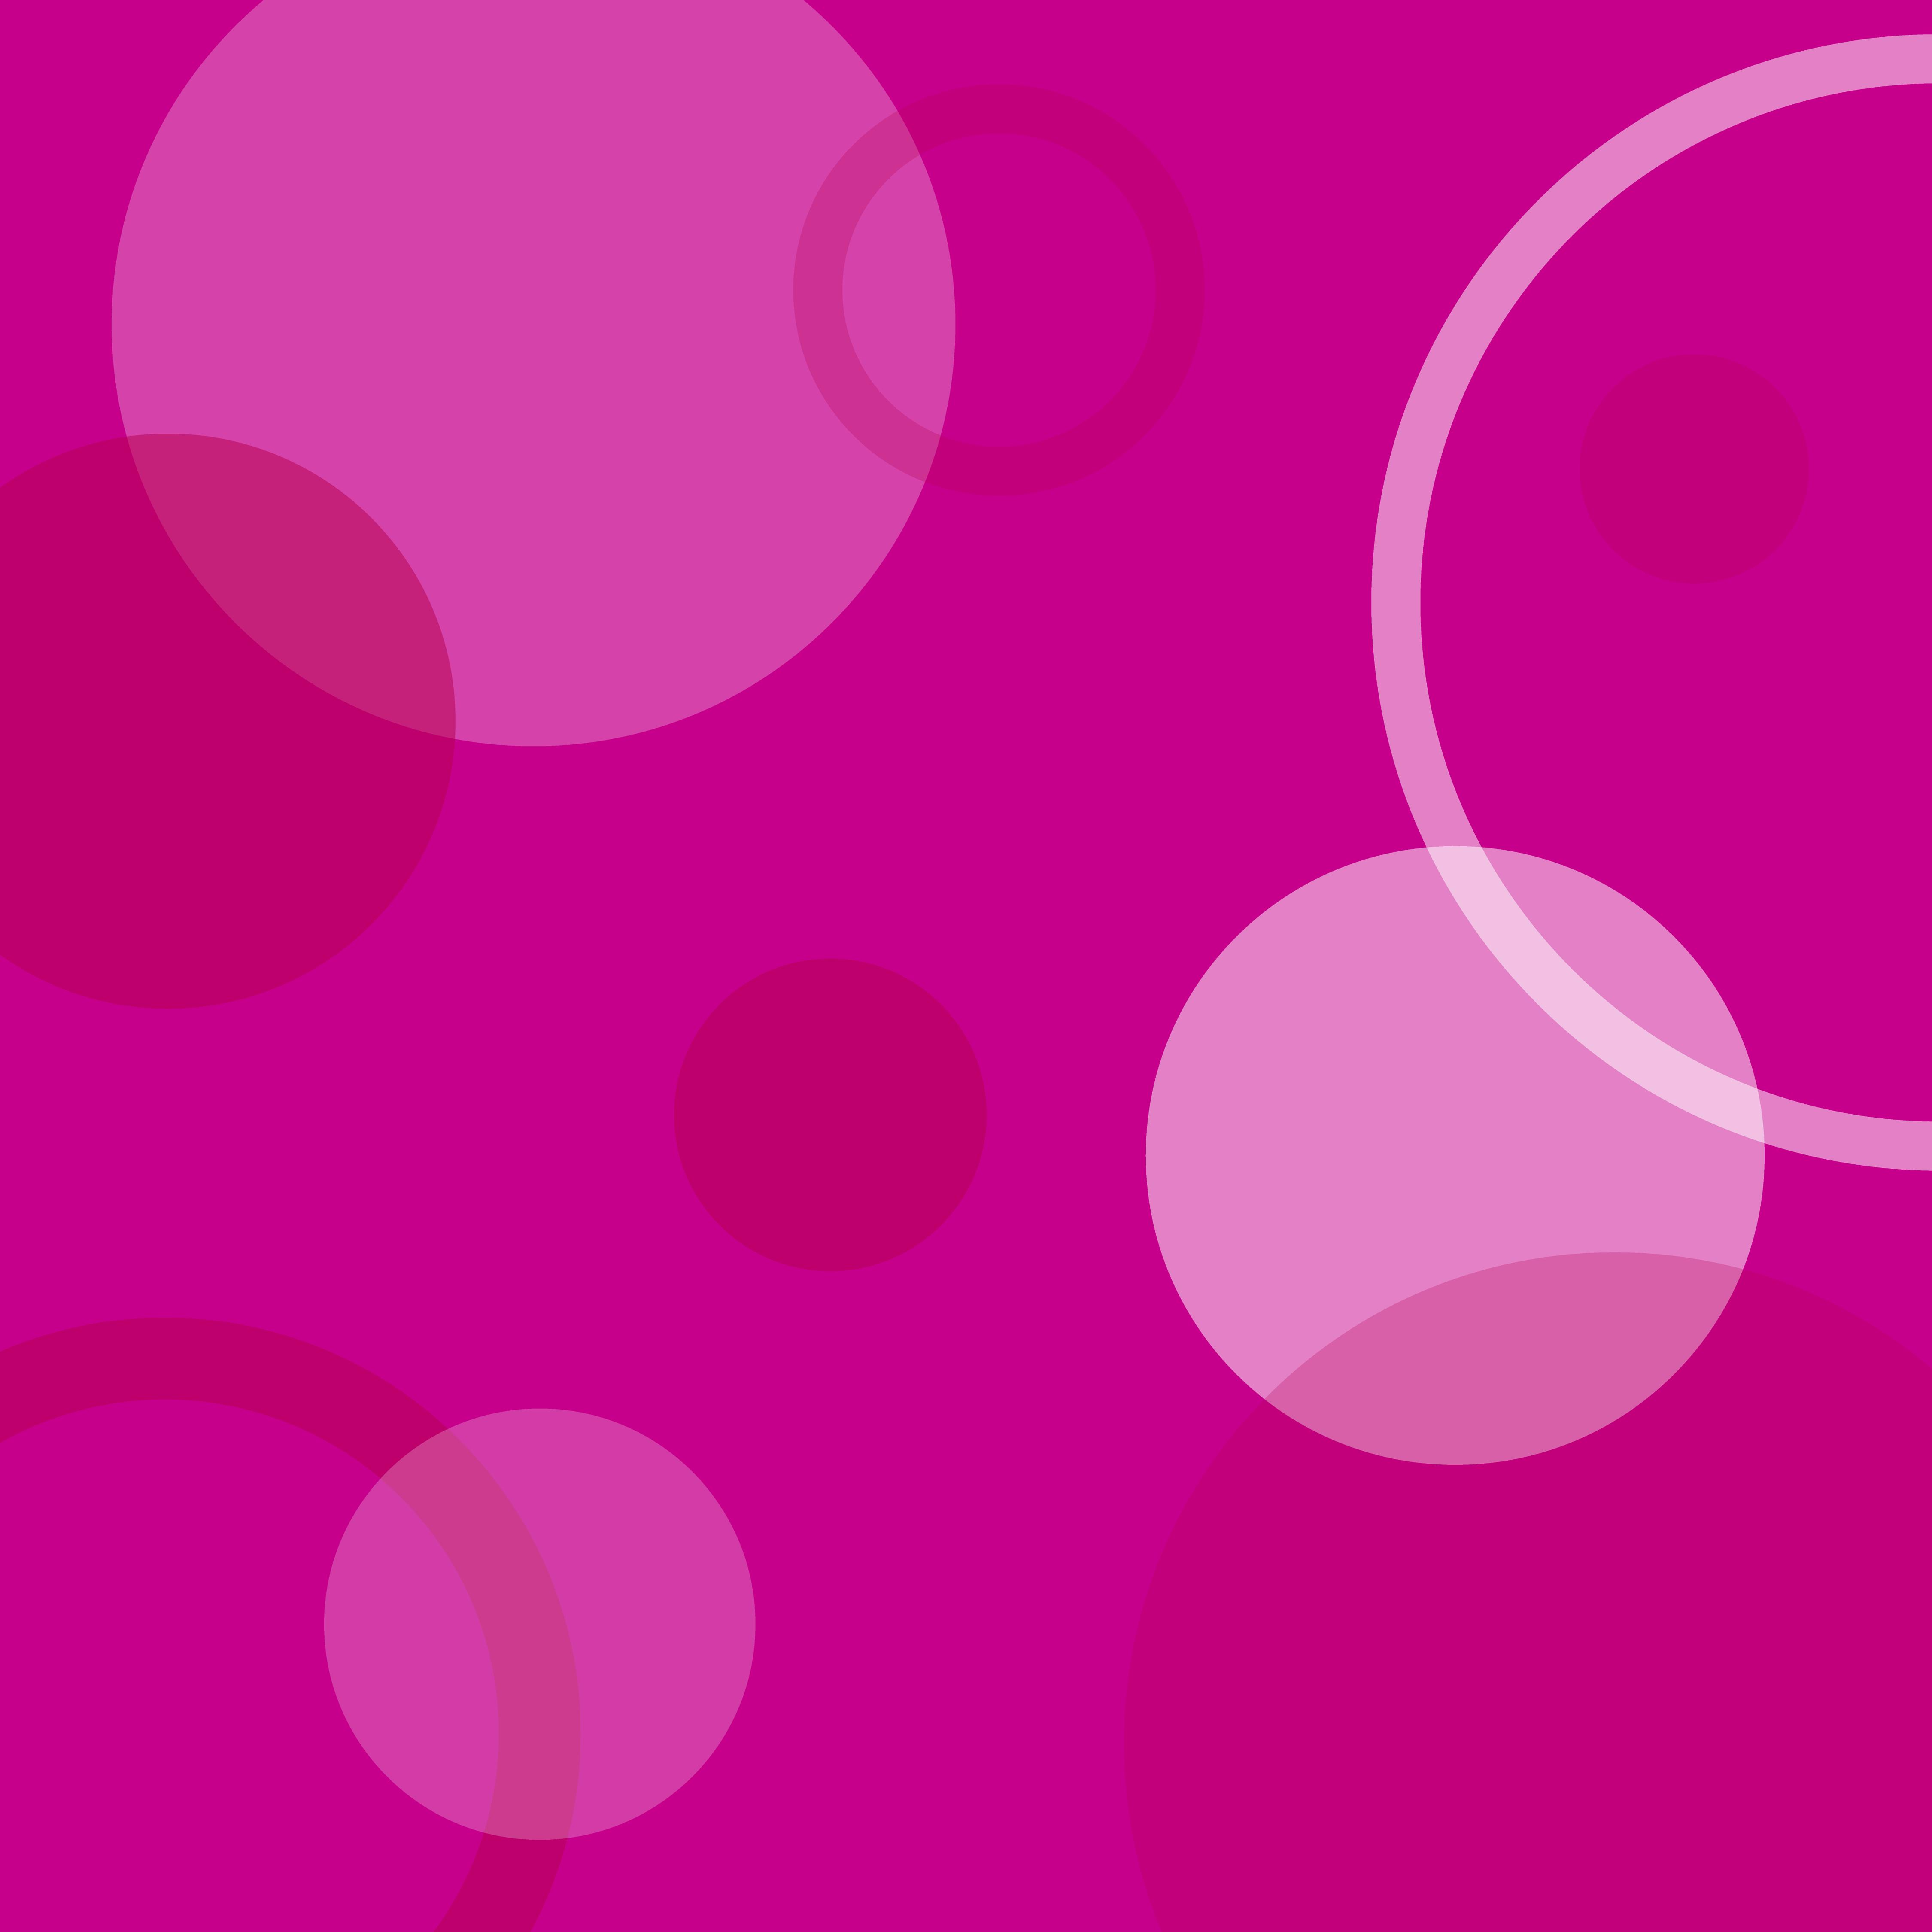 4500x4500 Circles Pattern Pink White Clip Art